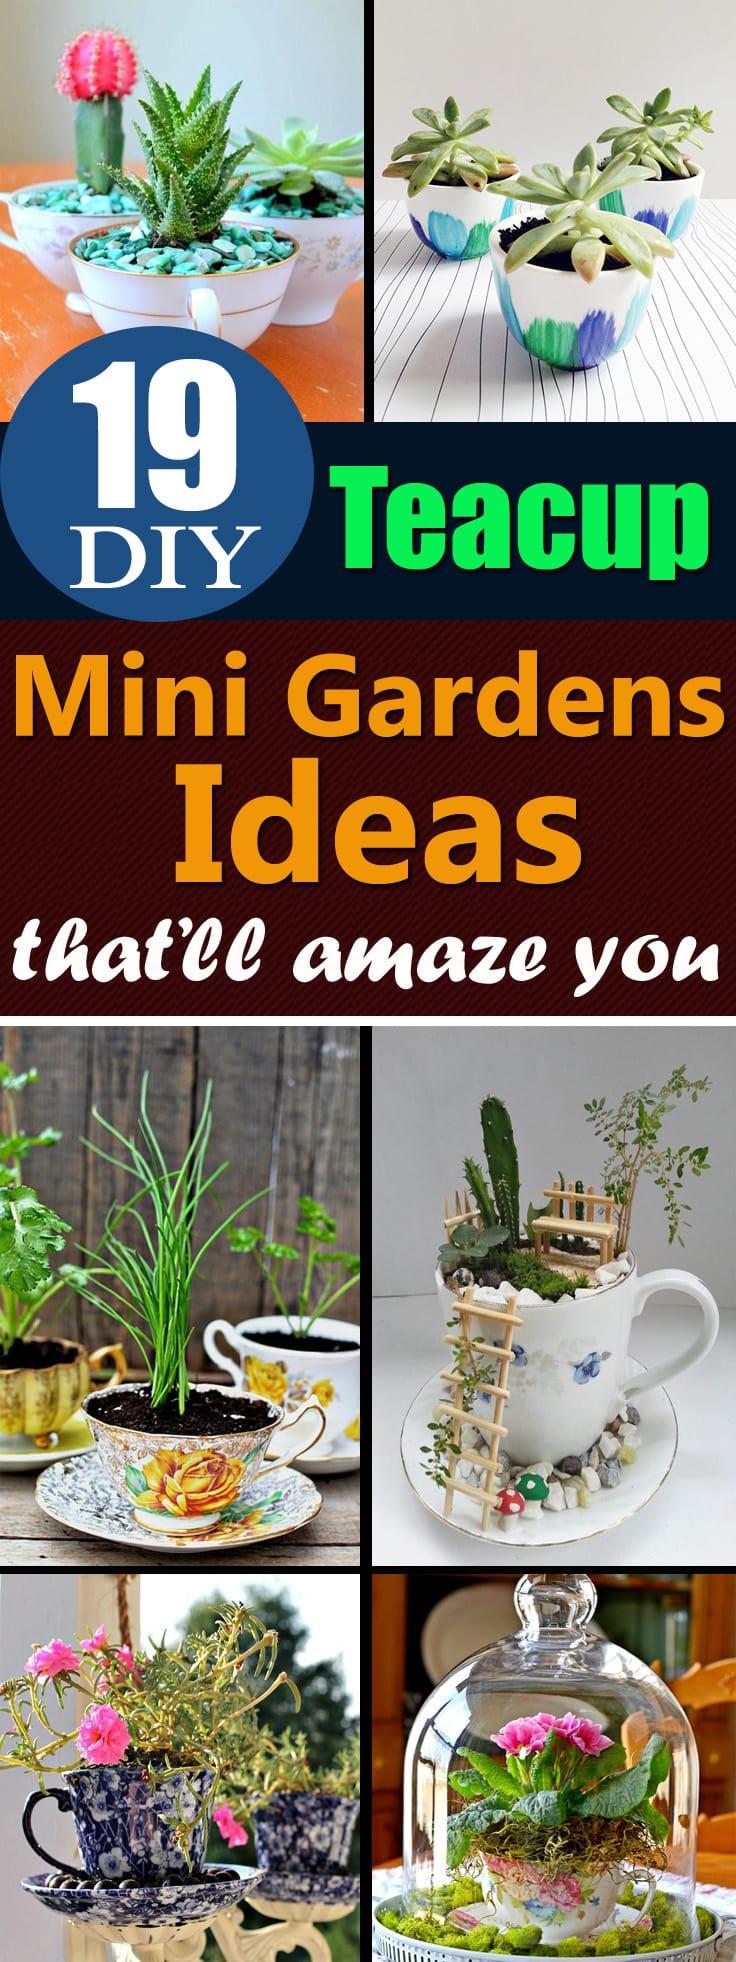 Fullsize Of Diy Mini Garden Ideas